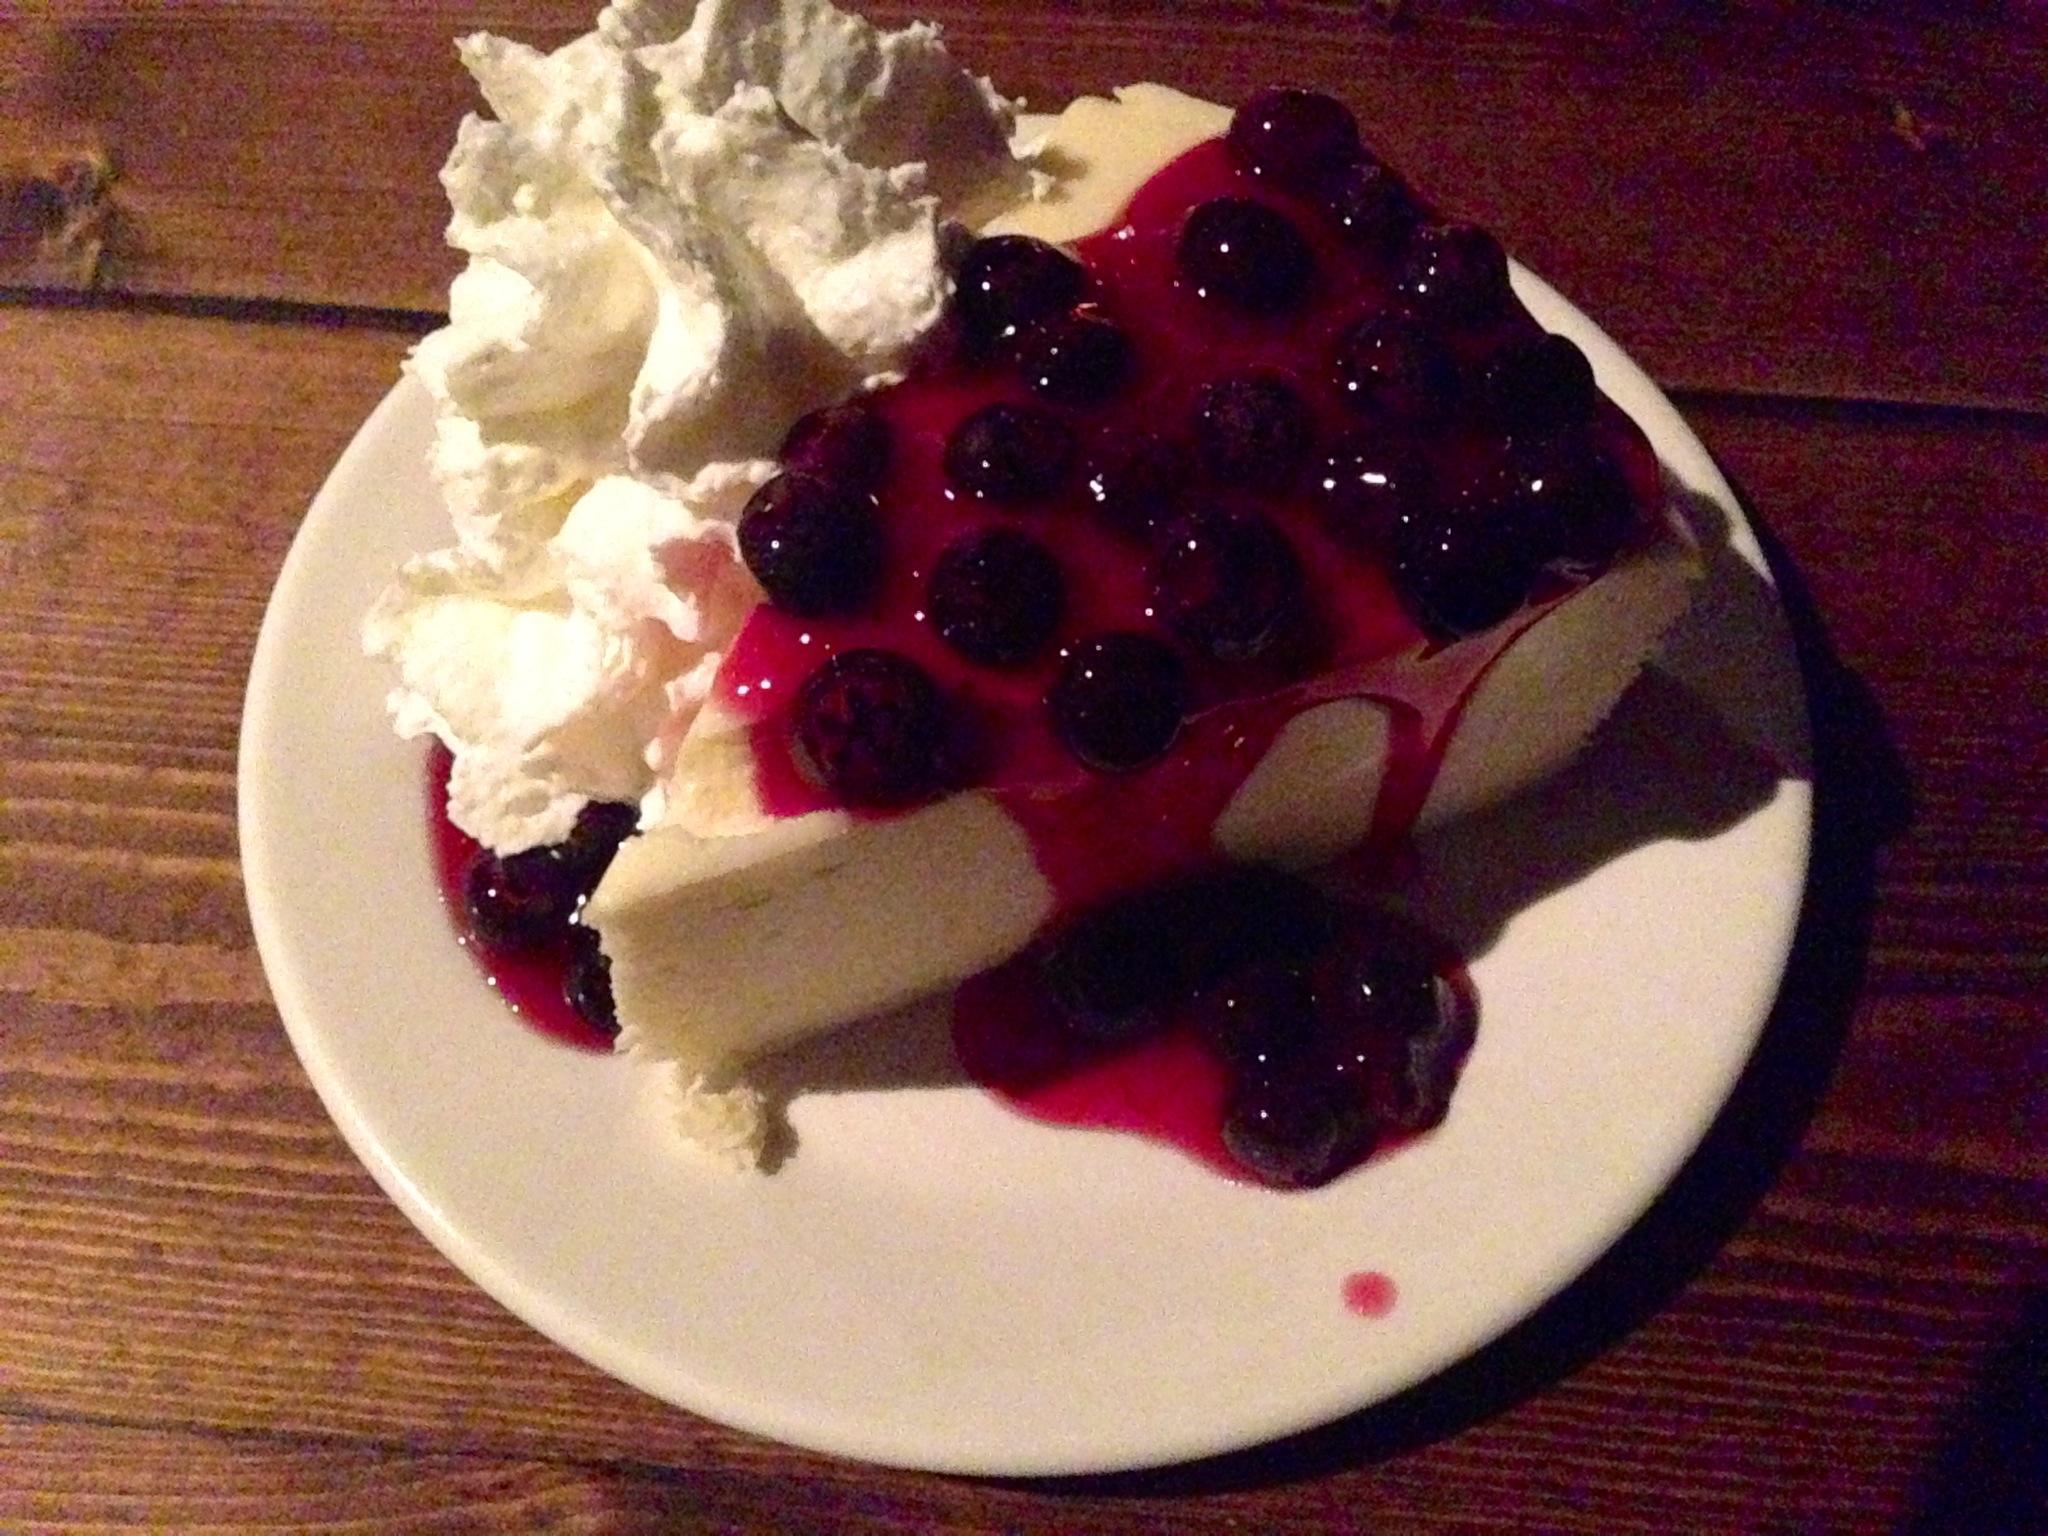 Original Cheesecake with Blueberries